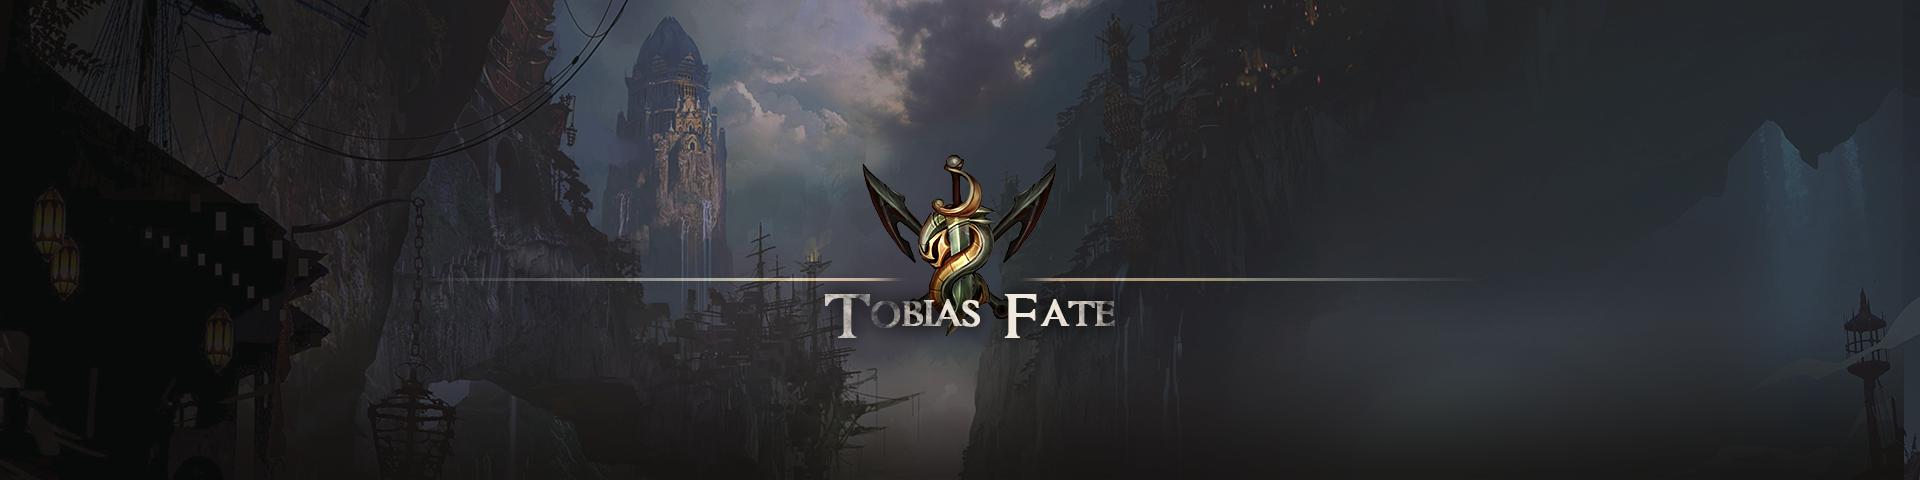 TobiasFate